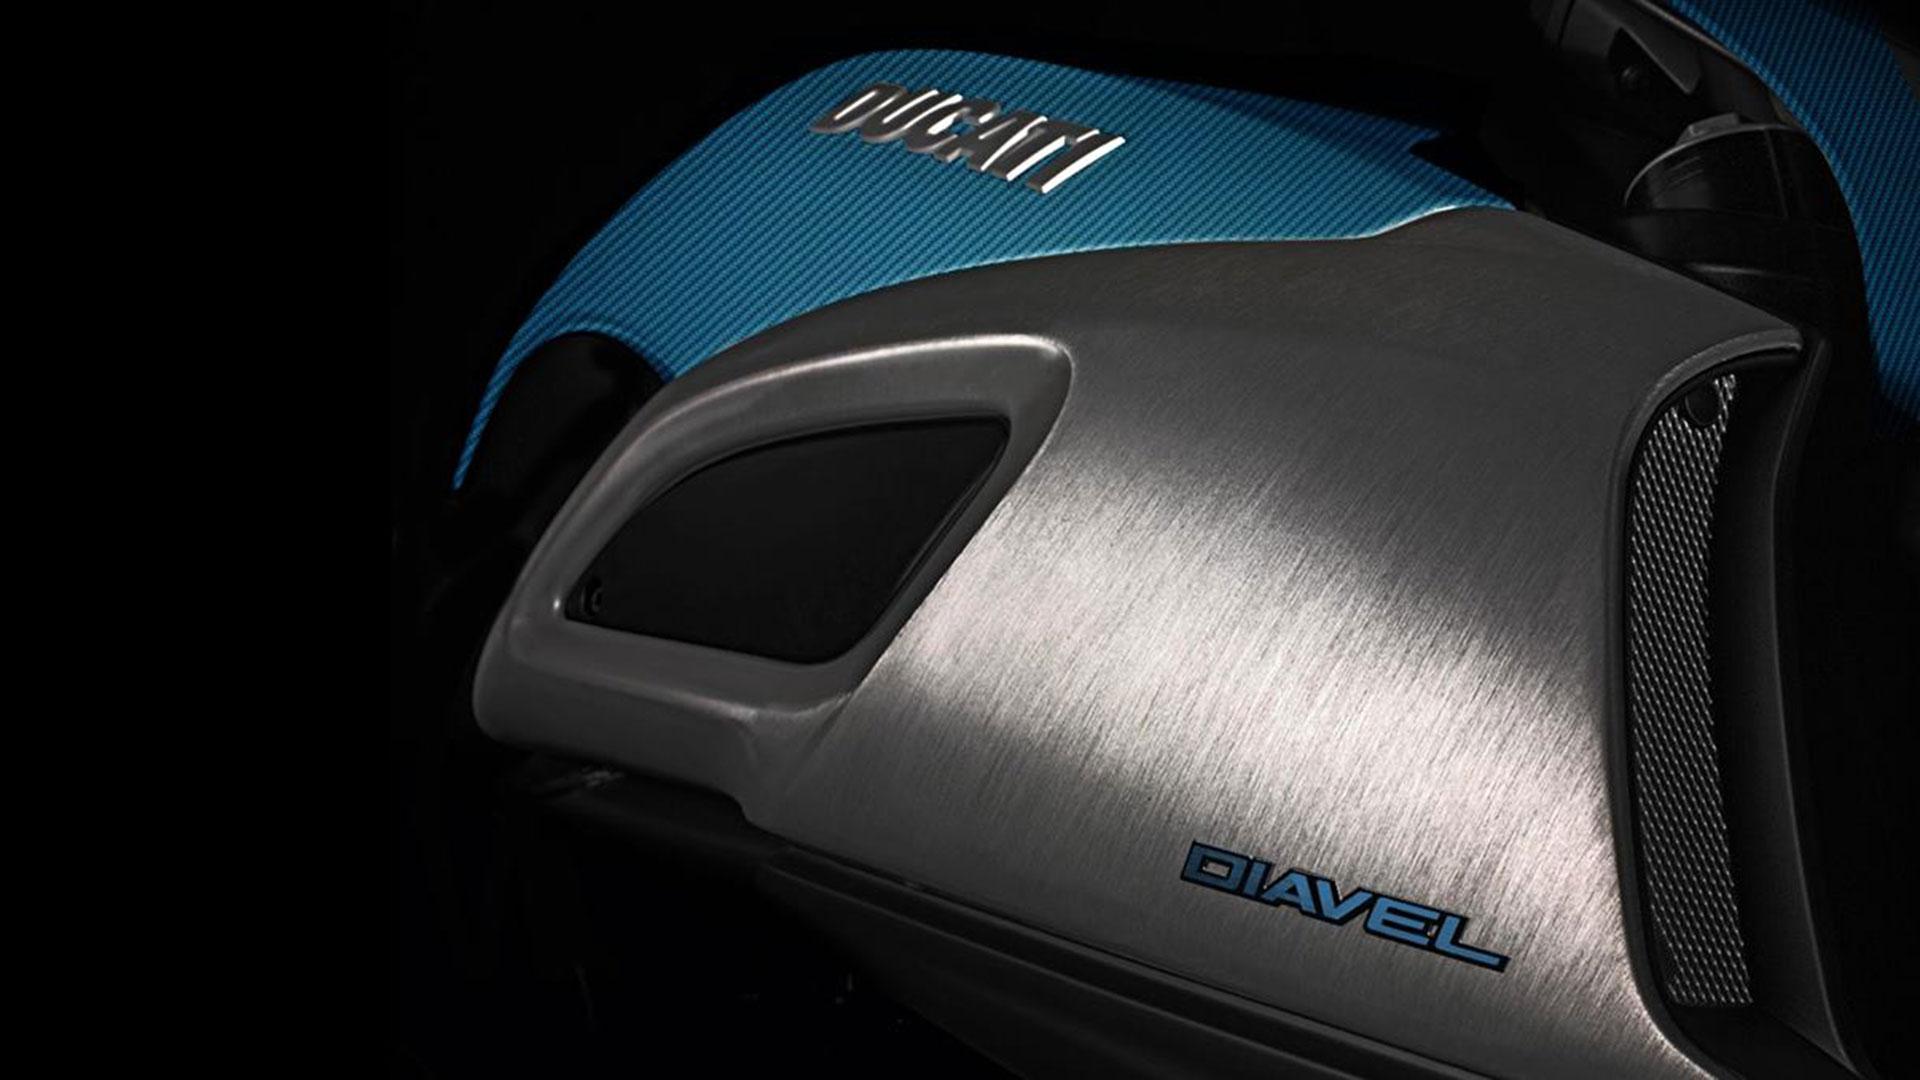 ducati-diavel-by-garage-italia-customs